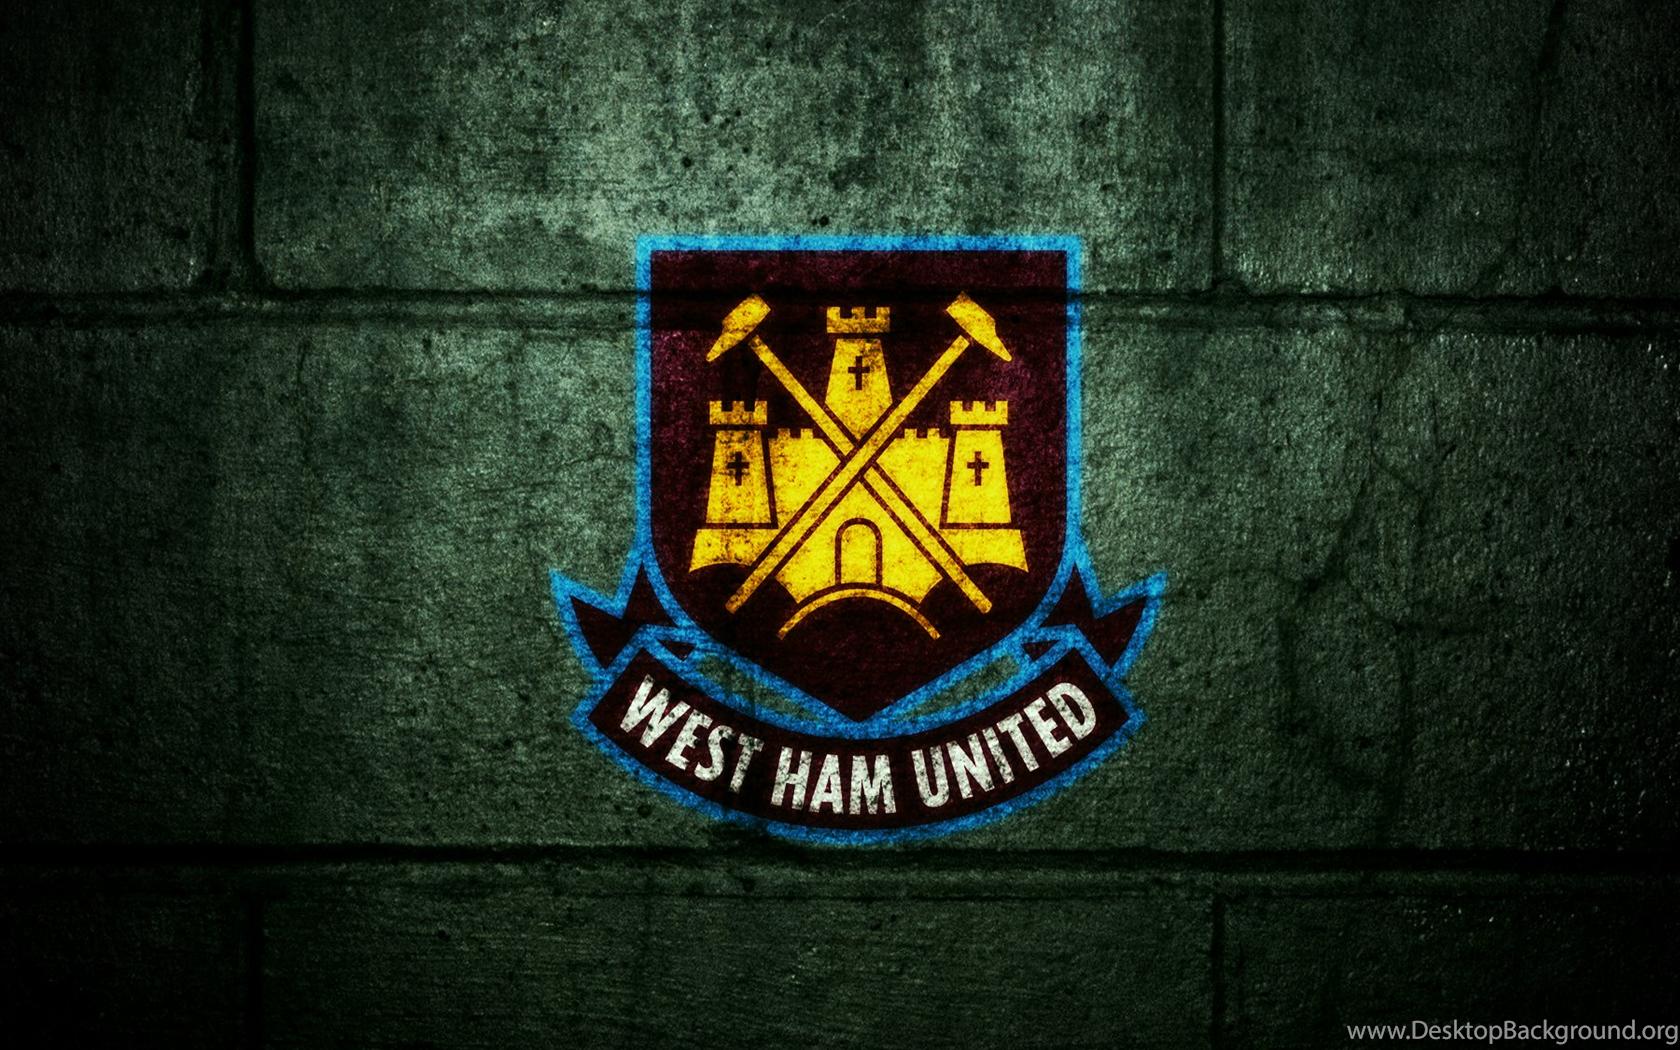 West Ham United Wallpapers HD Desktop Background